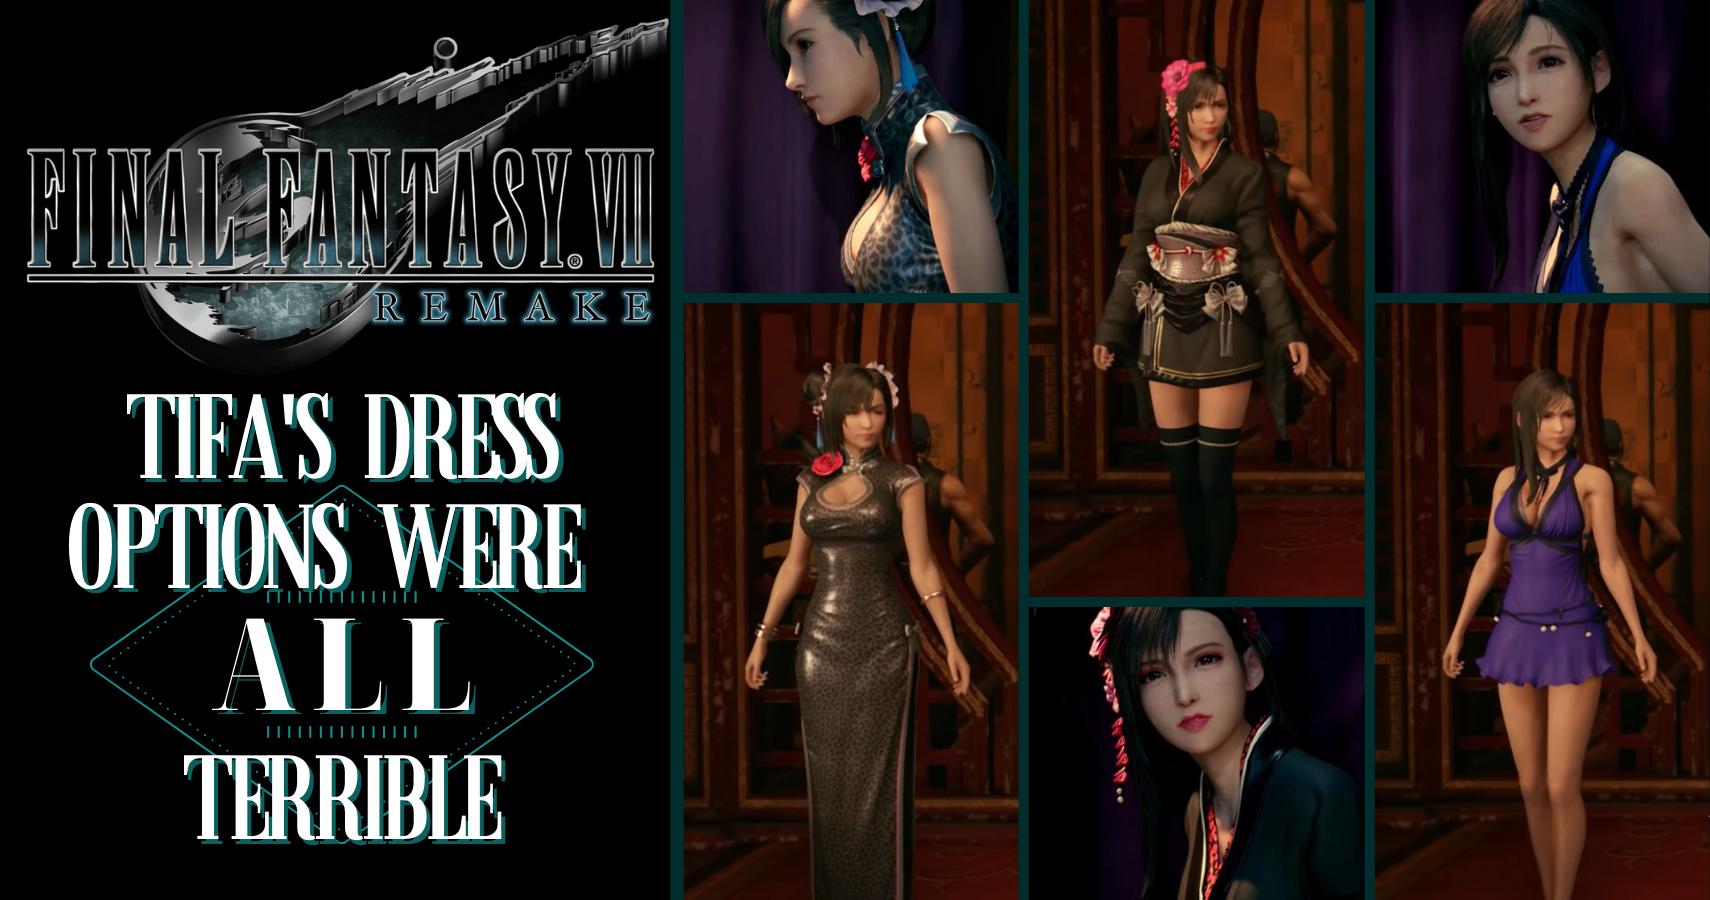 Ffvii Remake Tifa S Dress Options Were All Terrible Thegamer